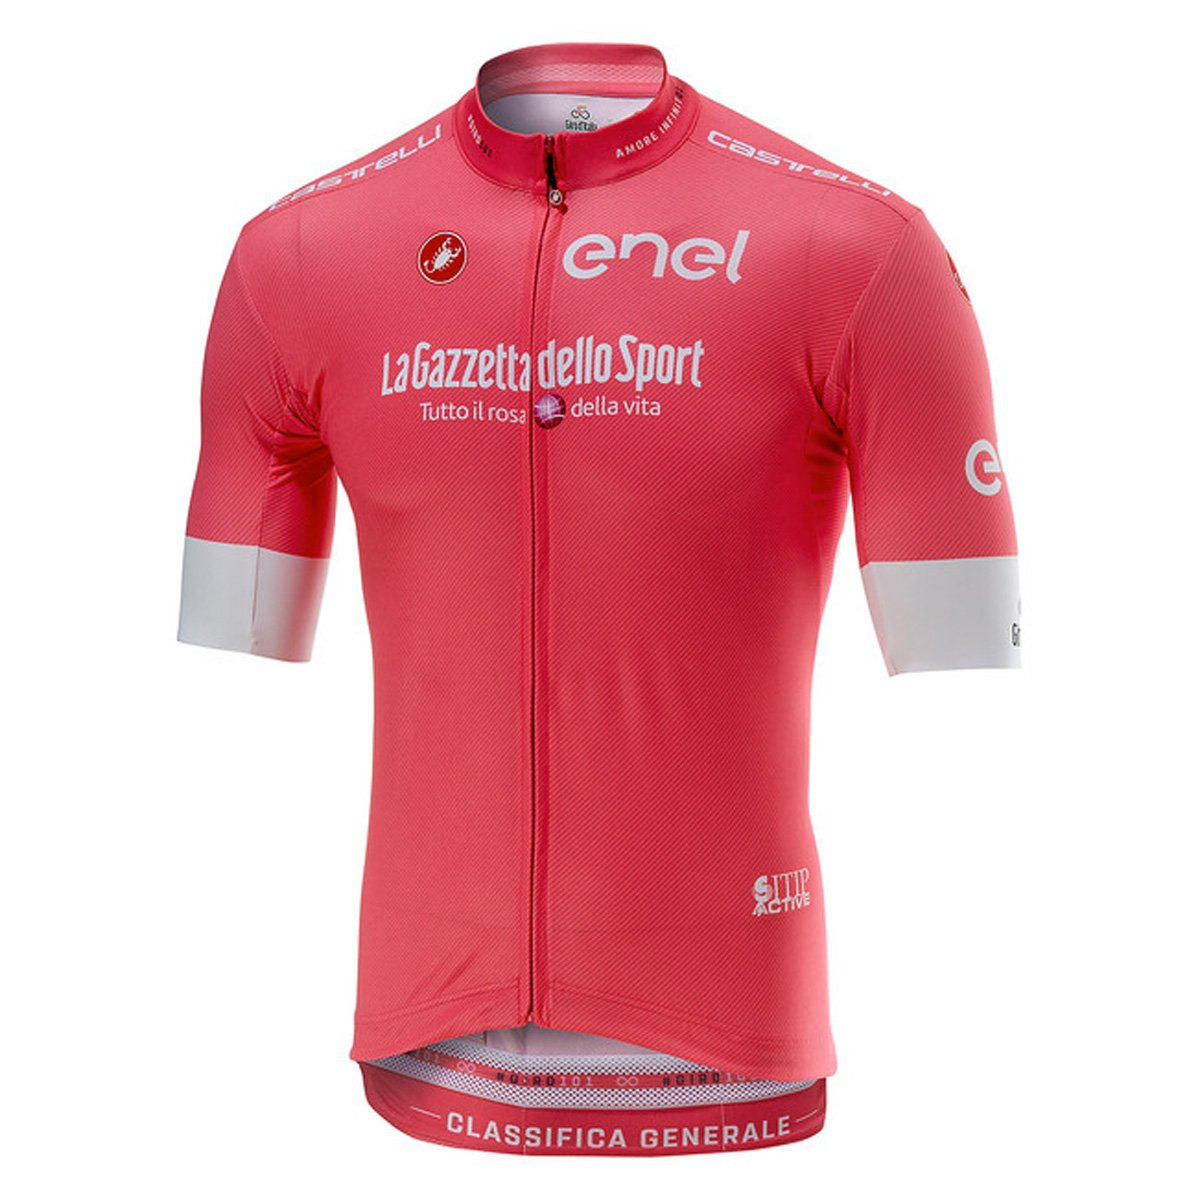 Castelli Giro d'Italia 101 Squadra Maglia Rosa